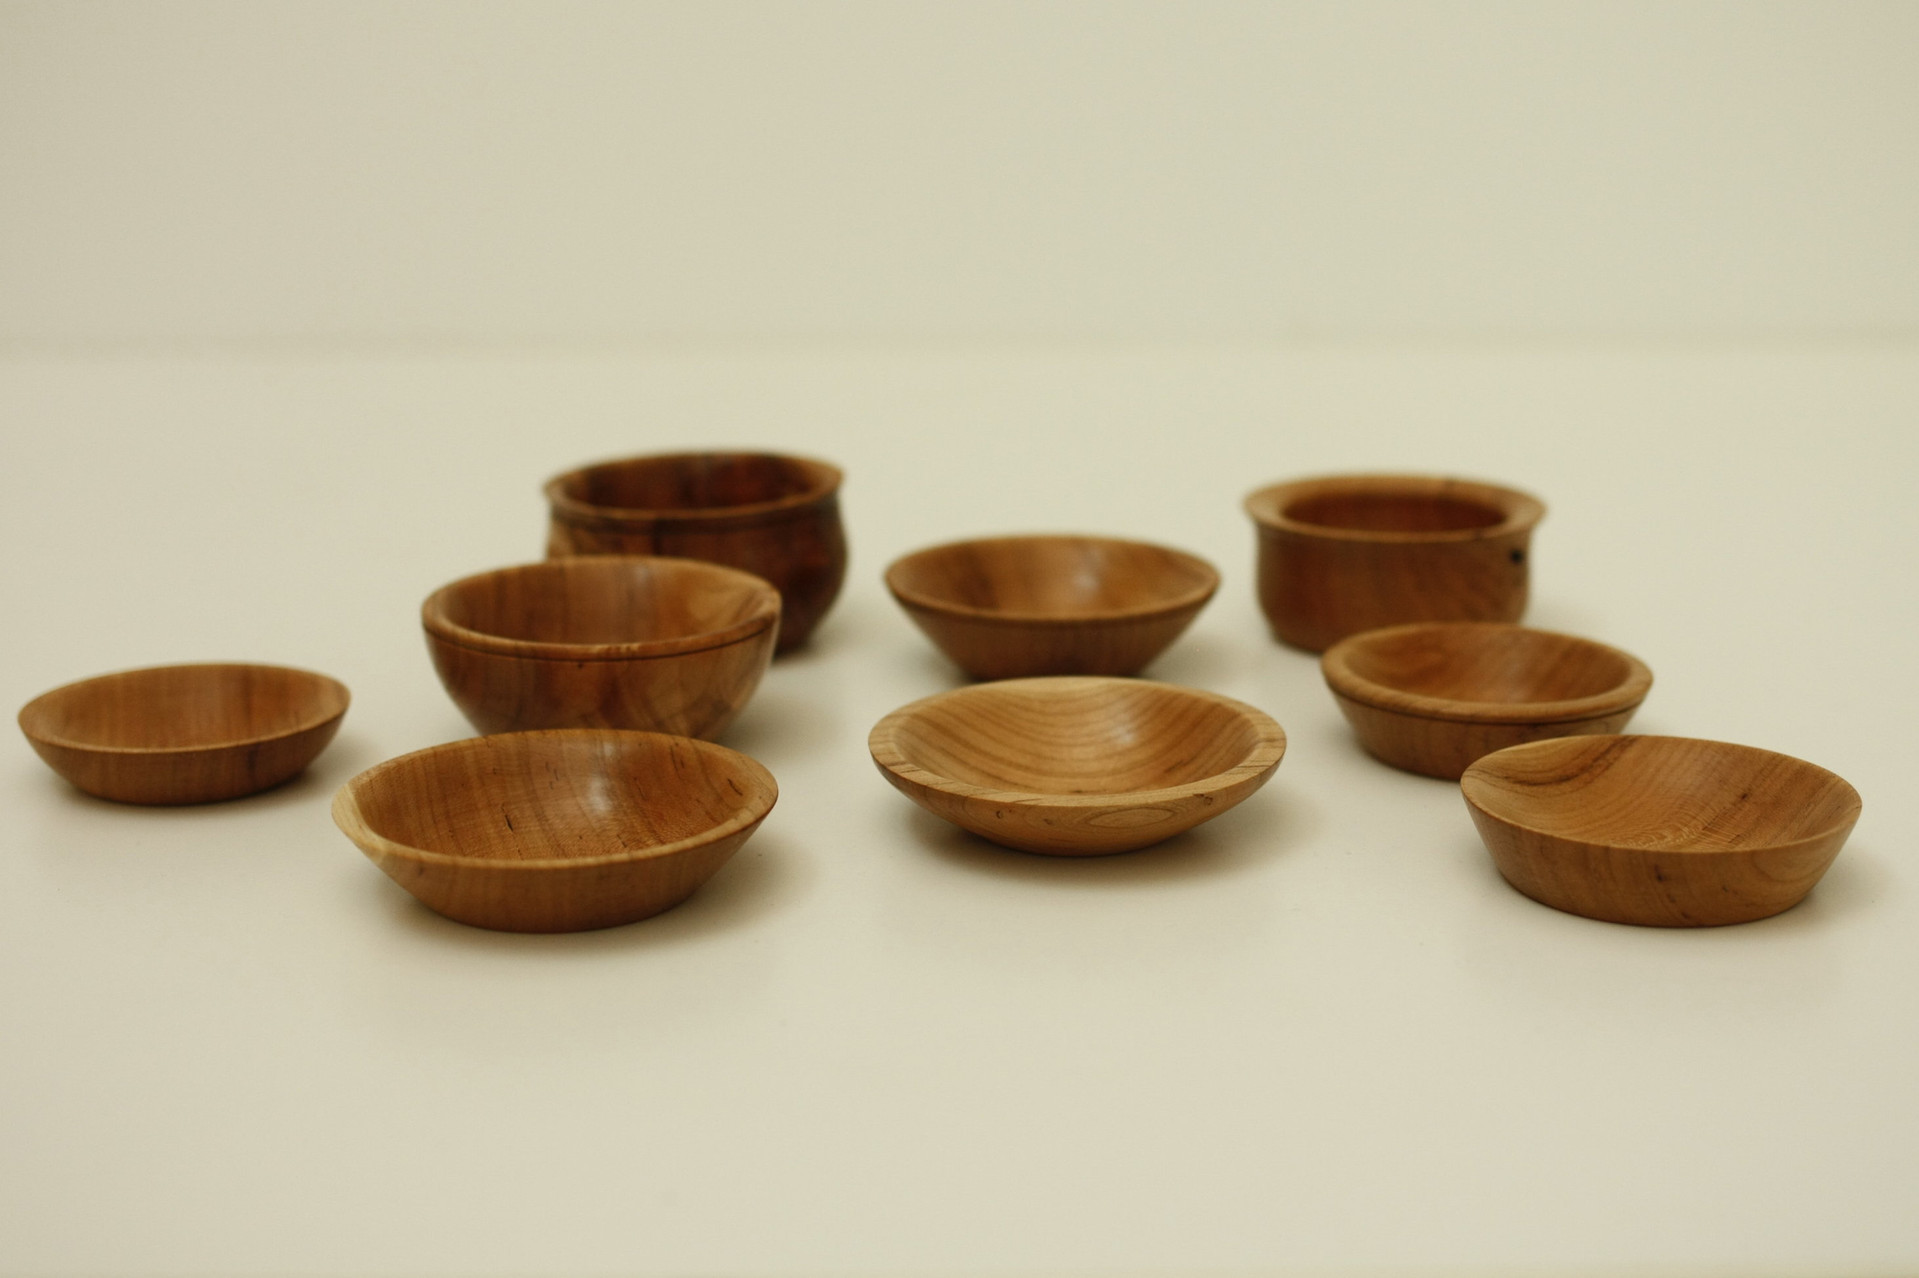 Small cherry bowls